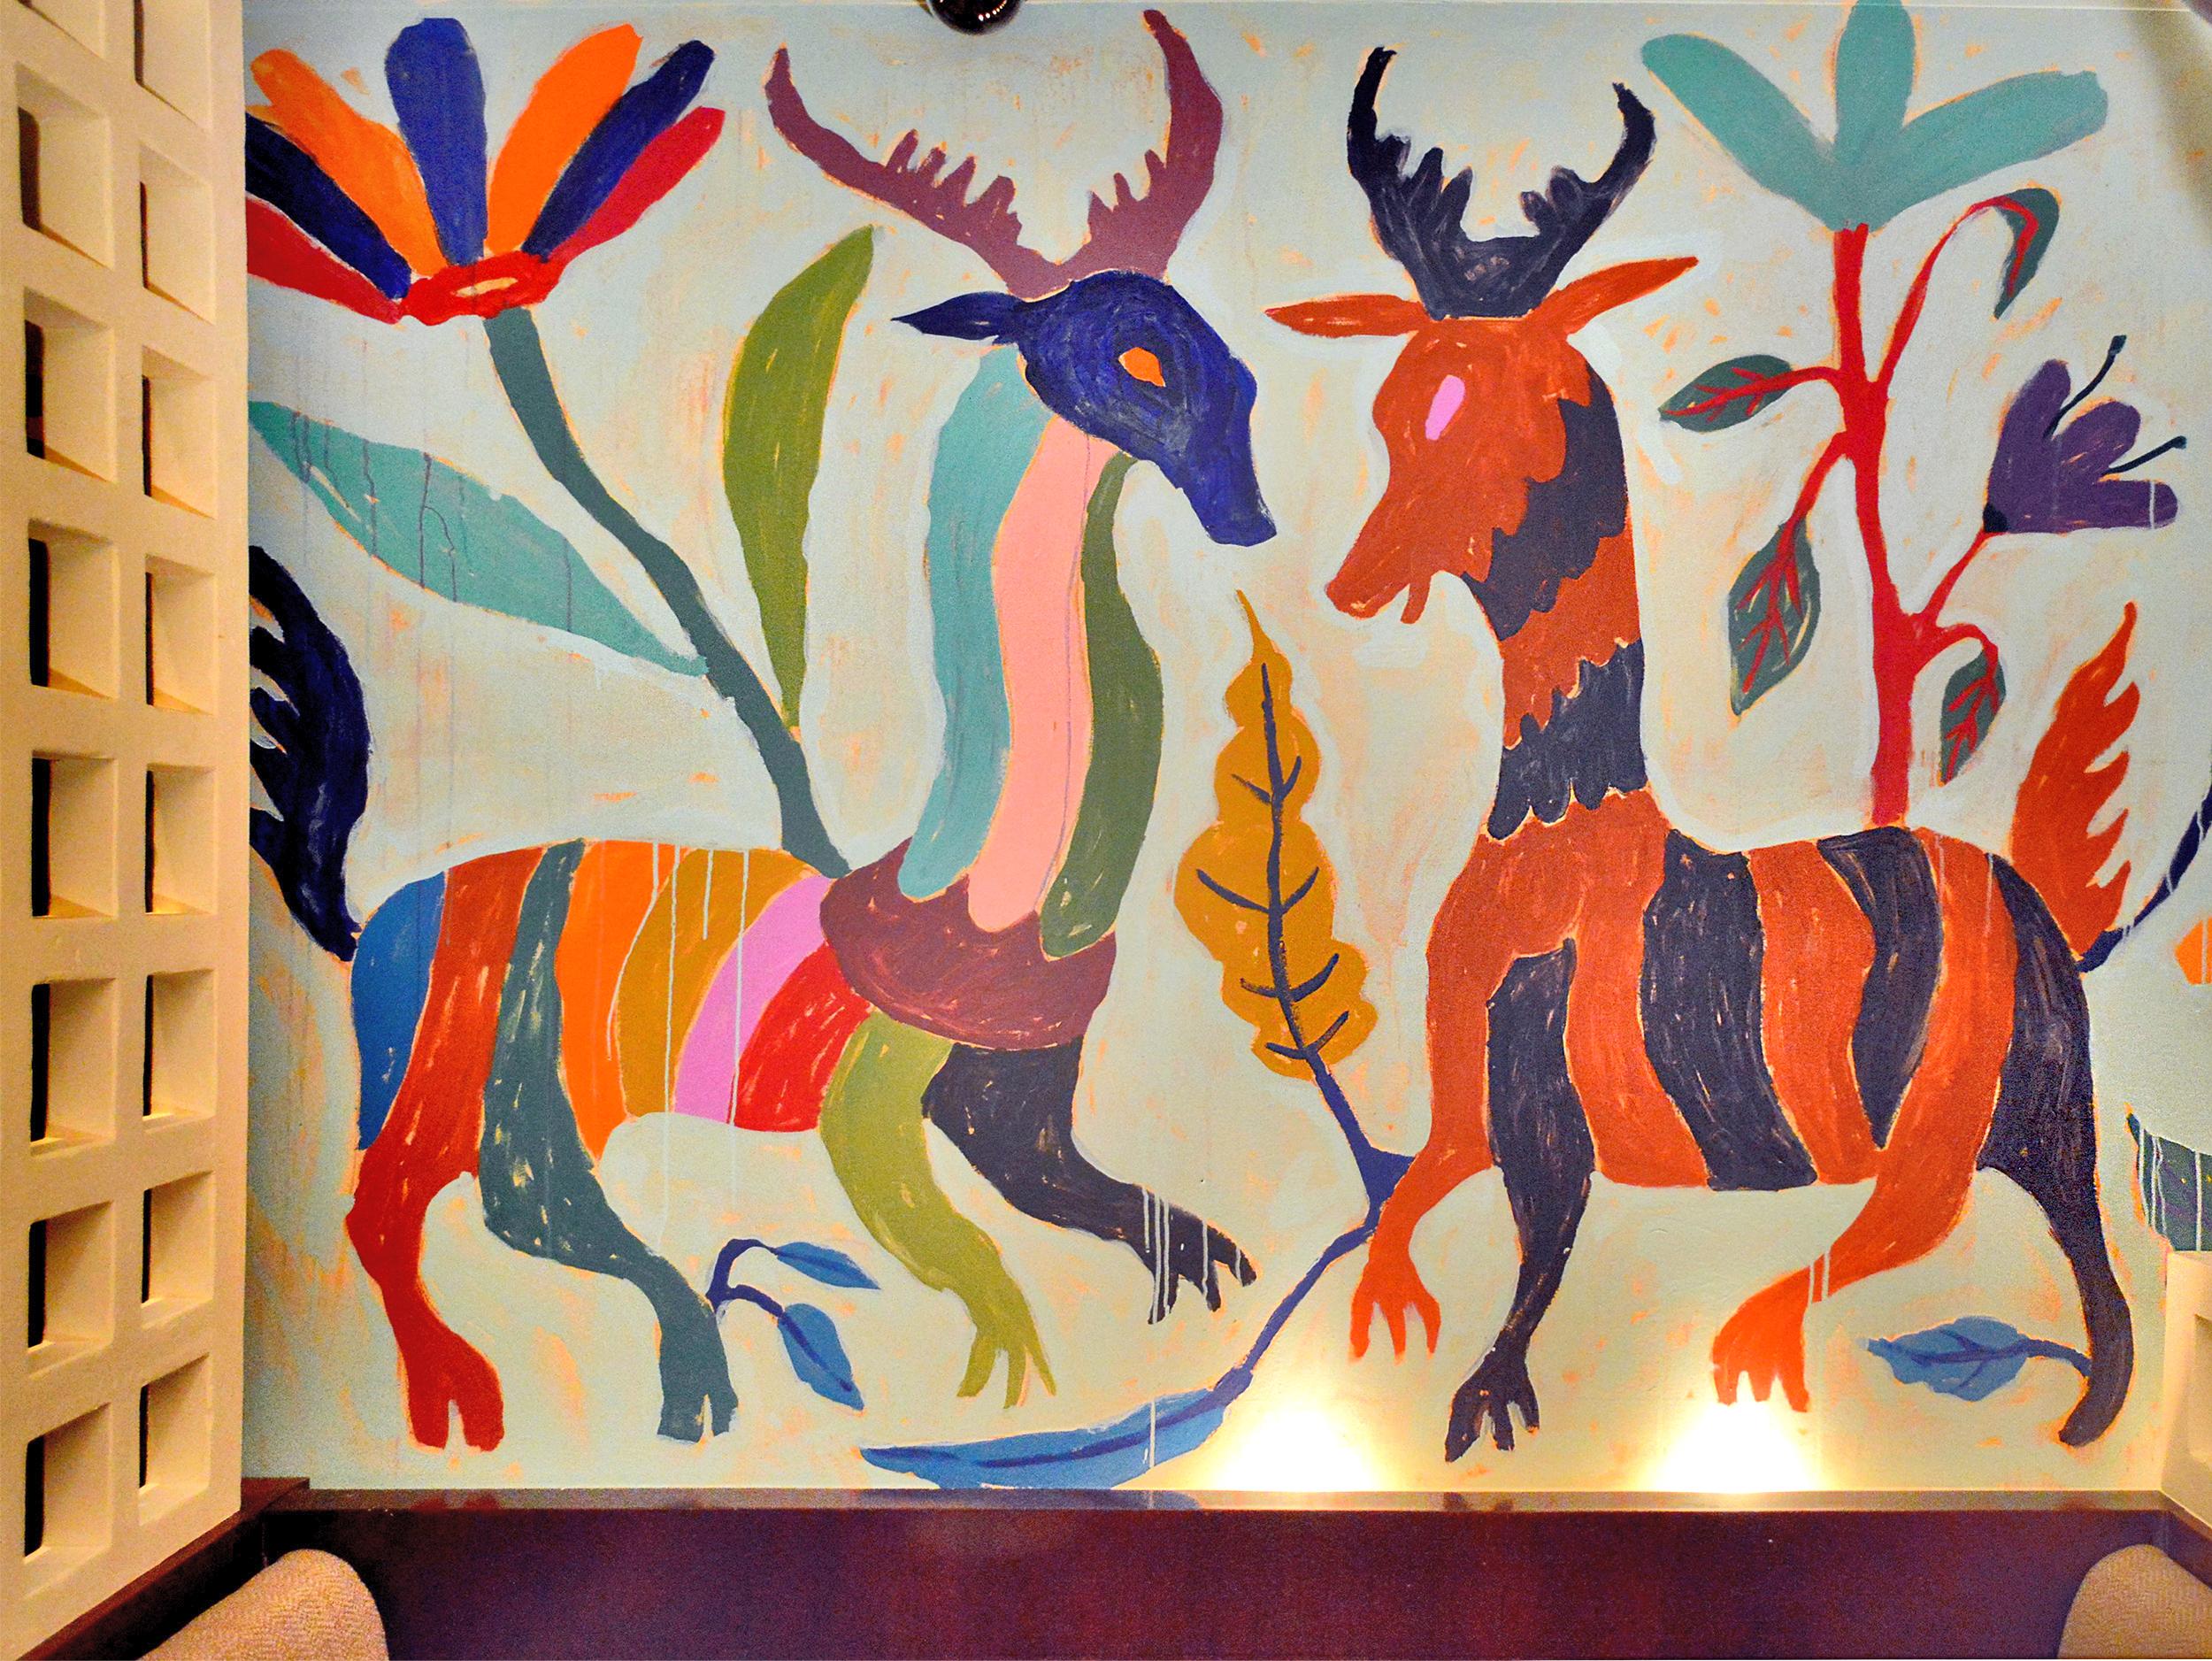 Dos Caminos Restaurant, Mural, Park Ave, NYC